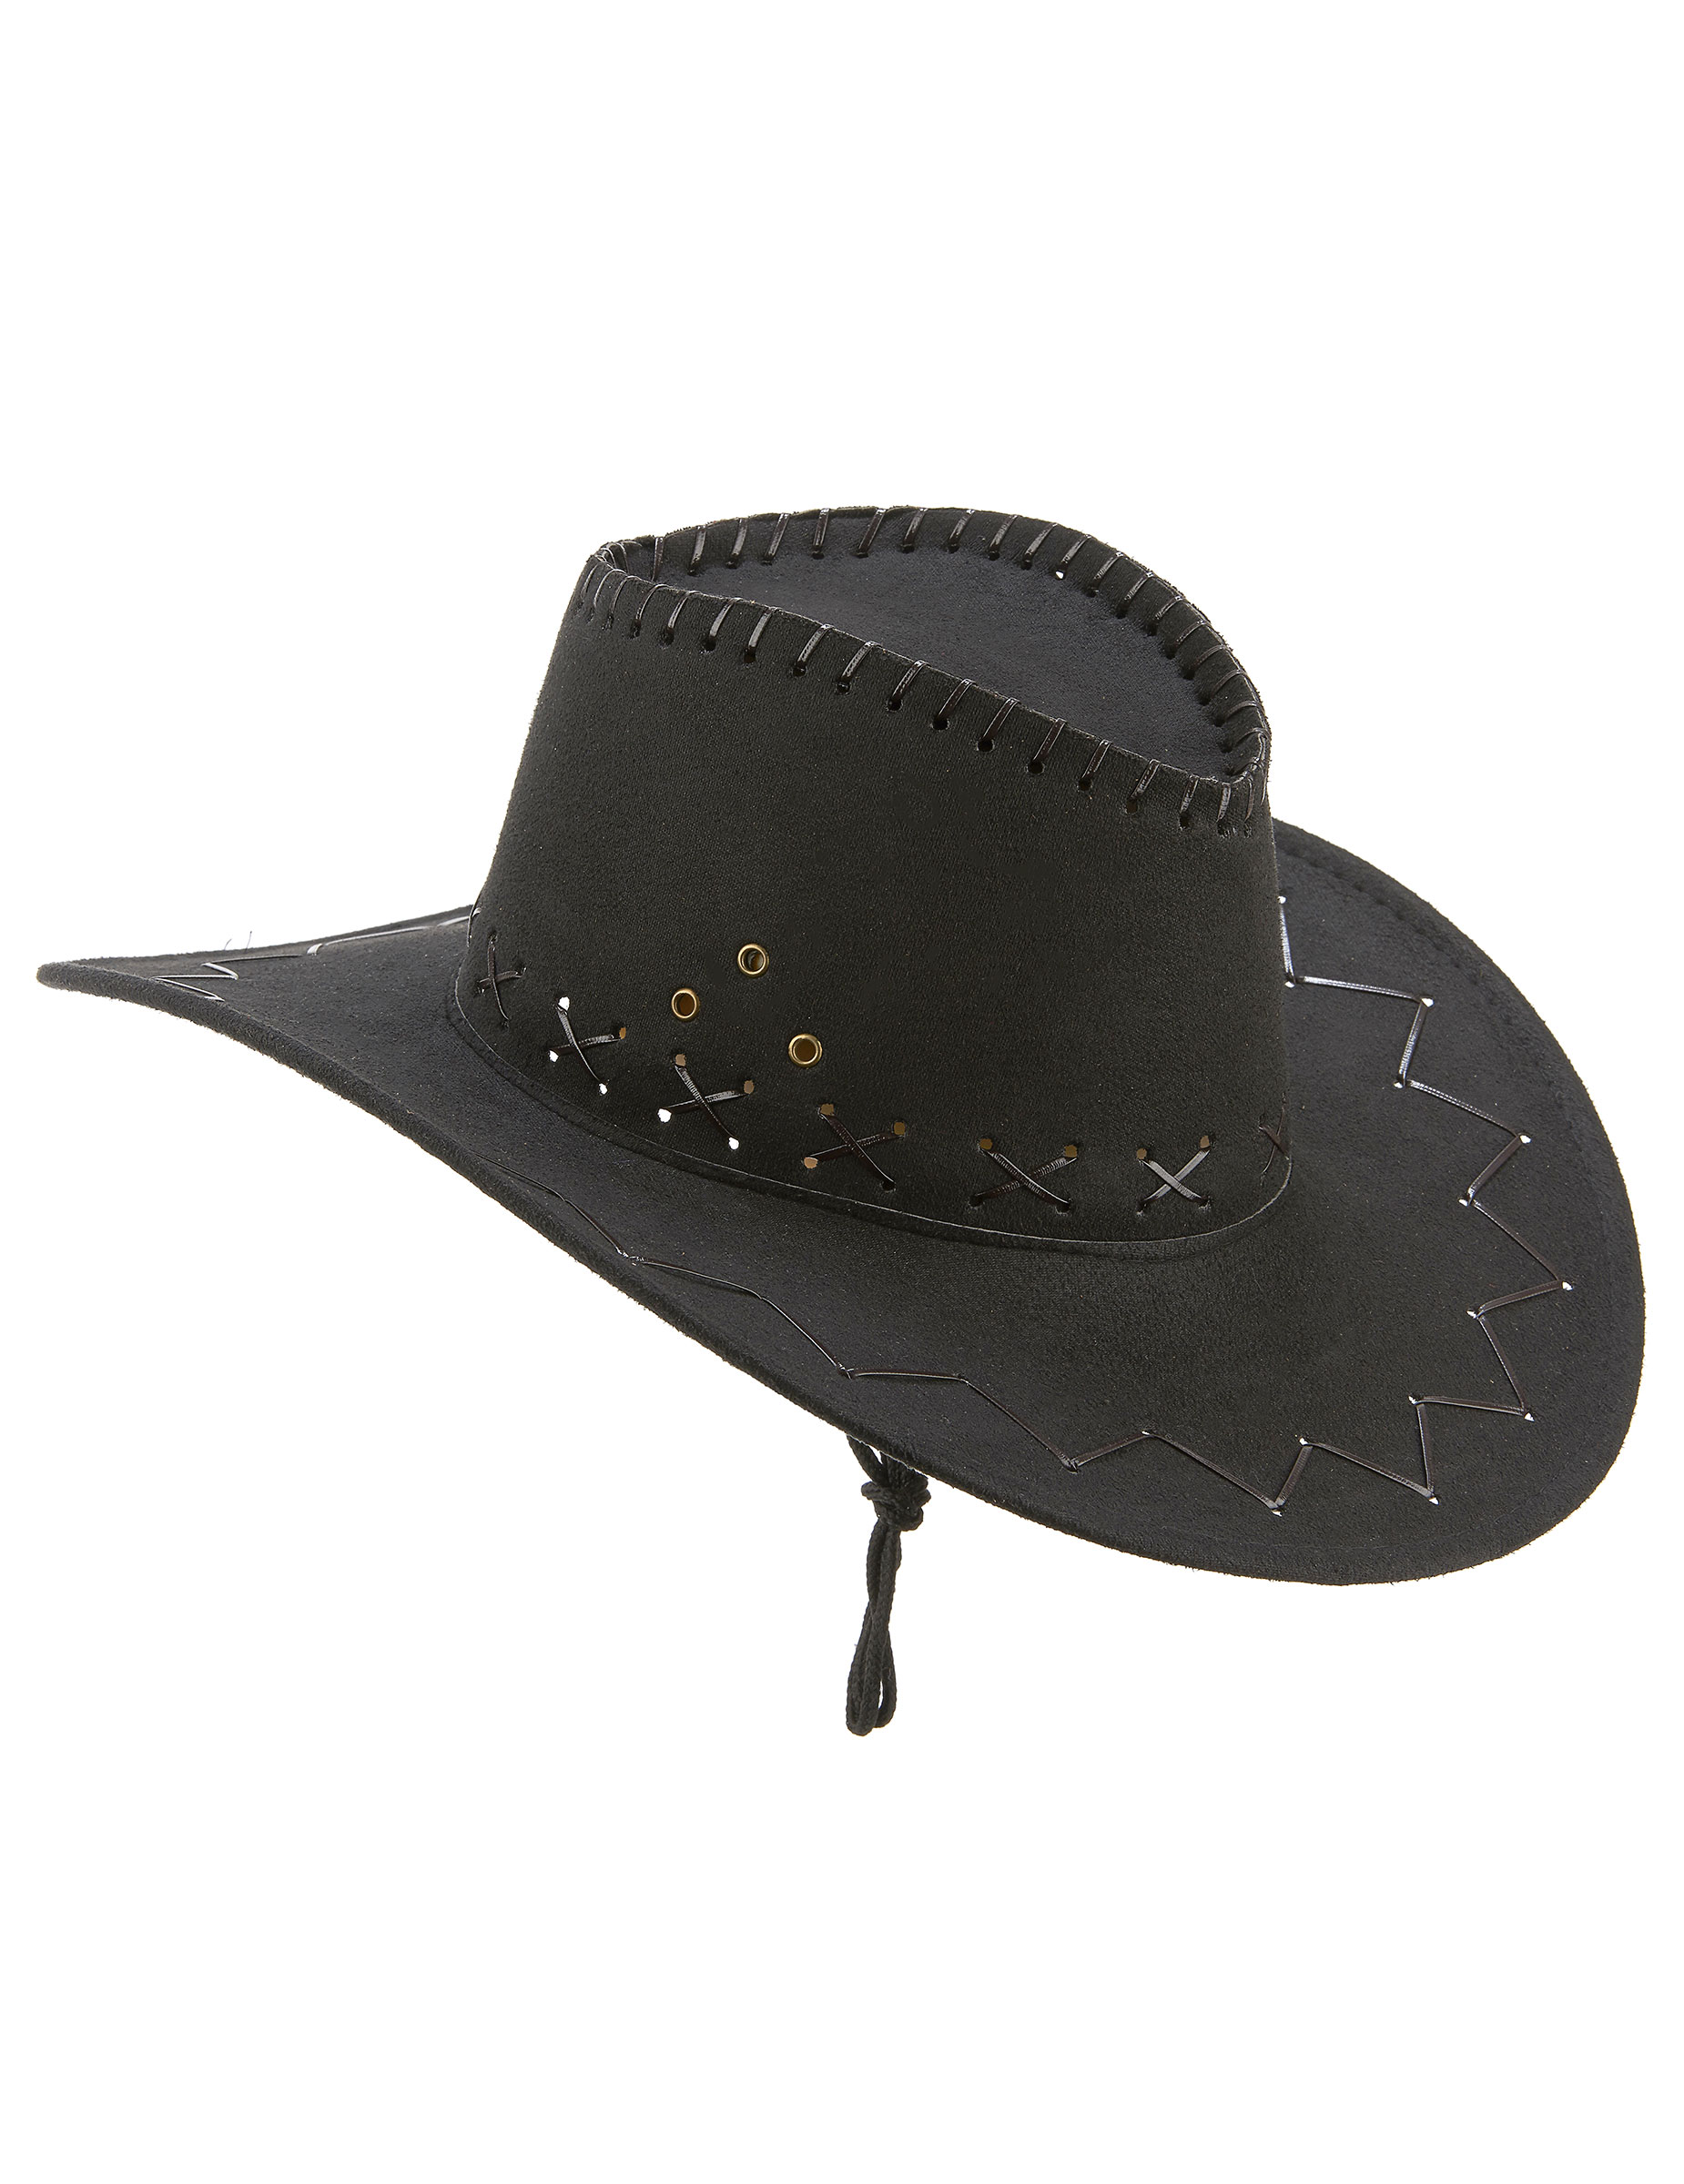 Sombrero vaquero negro adulto  Sombreros 092a23e7d8b